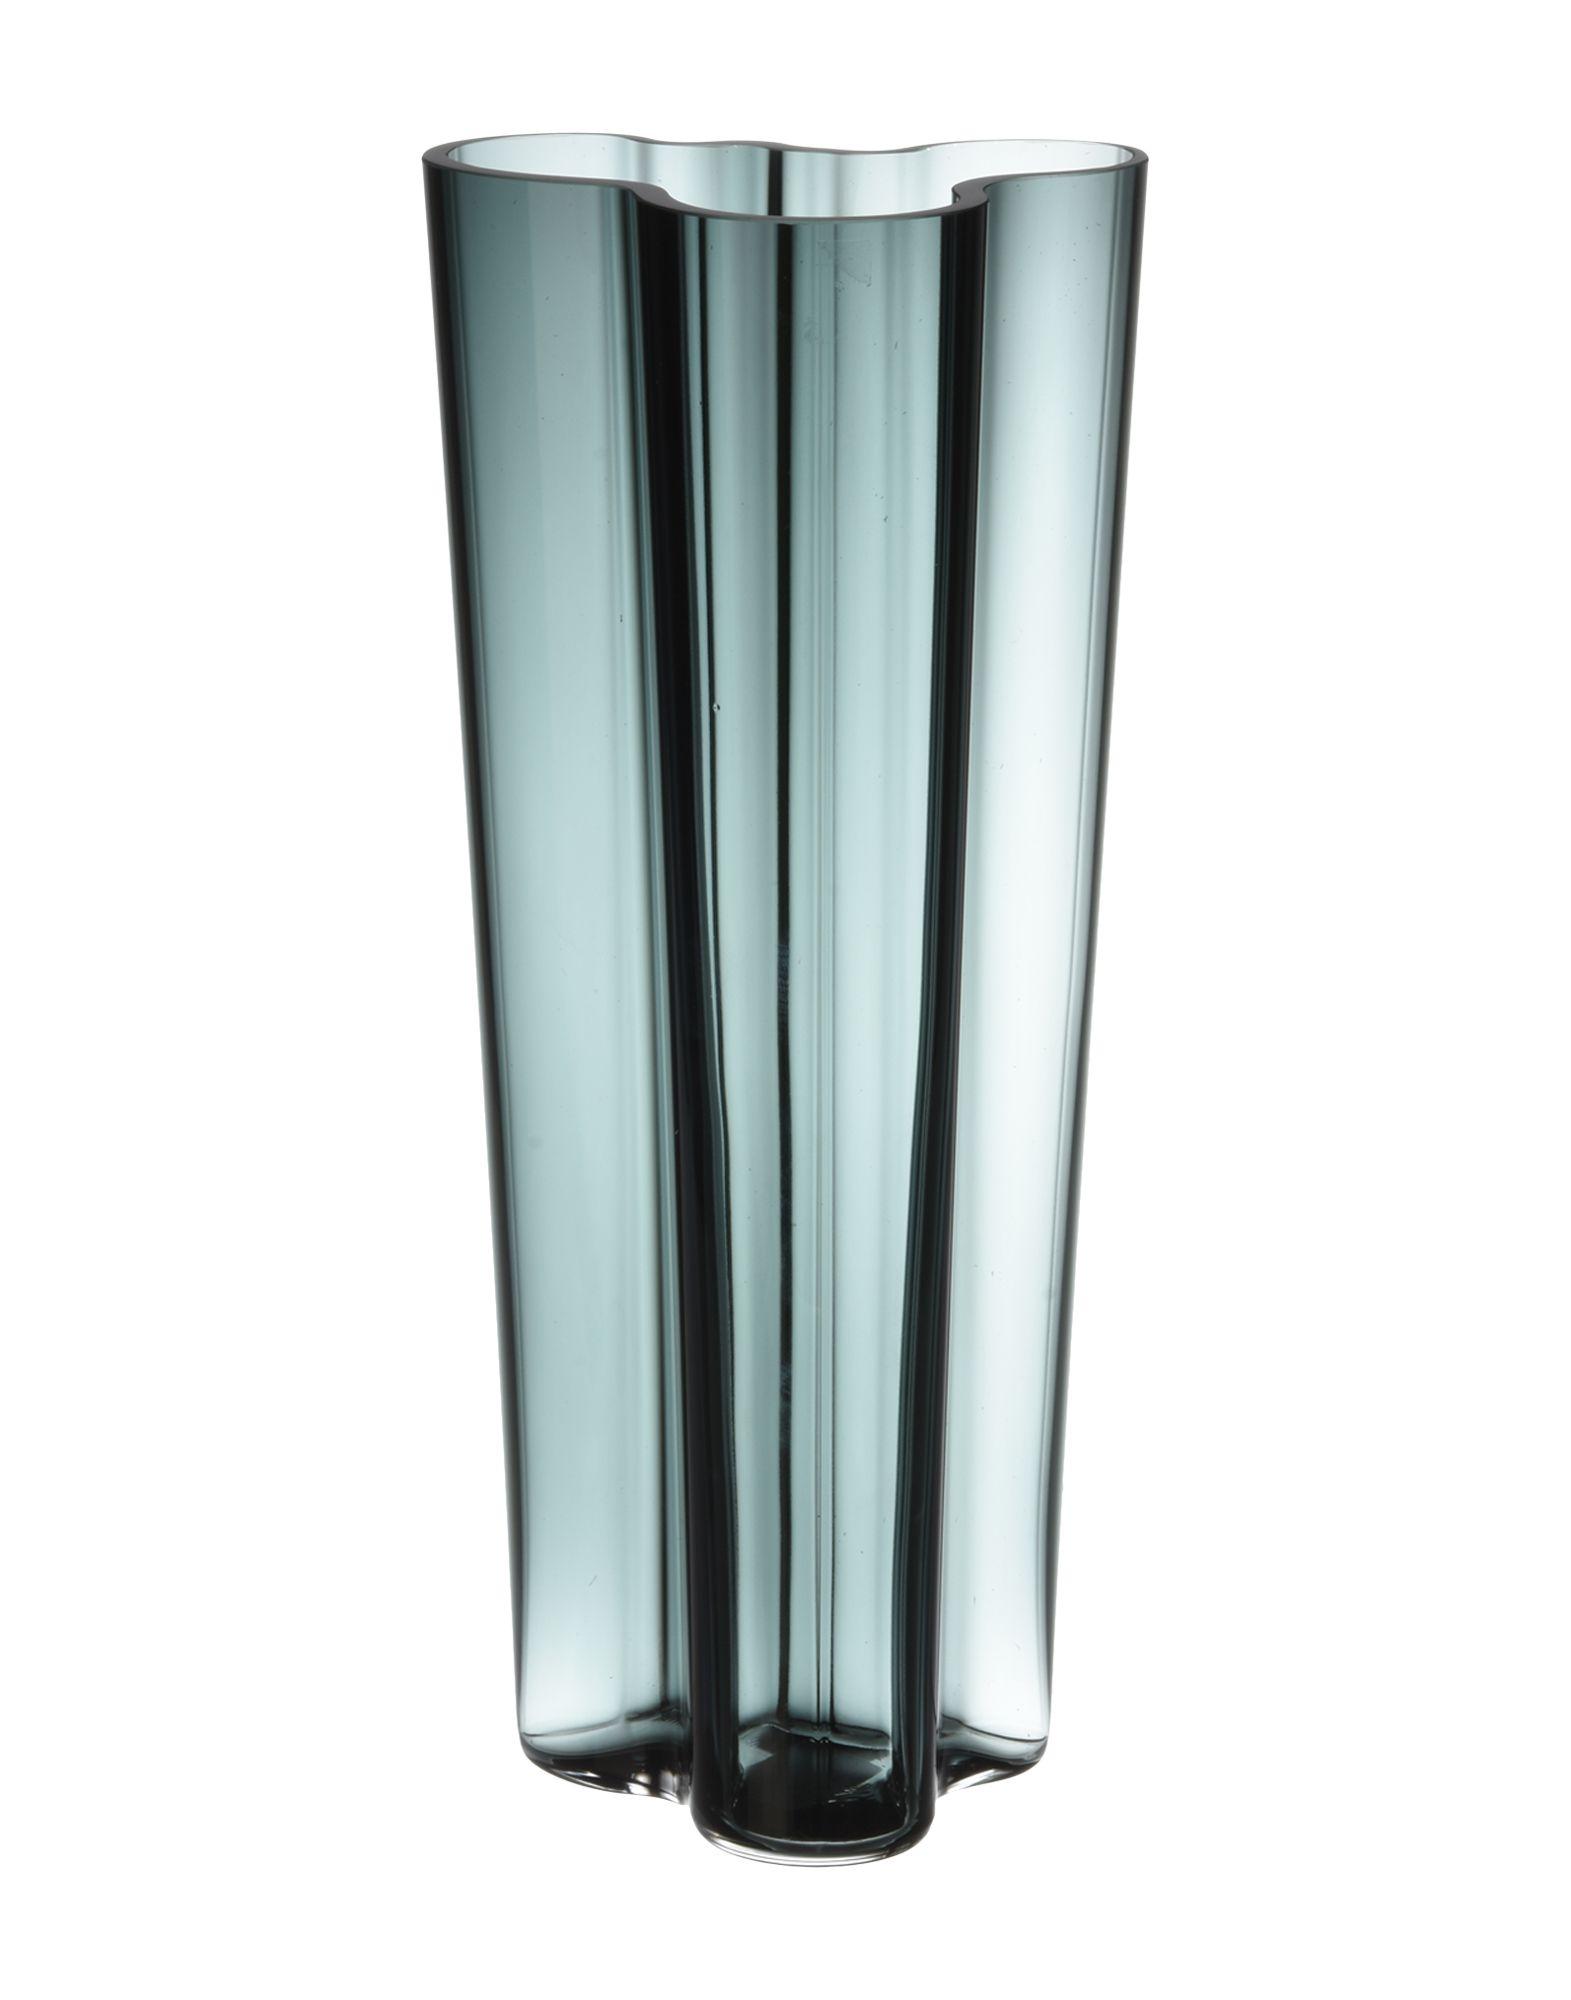 Iittala iittala complementi d 39 arredo vasi on yoox for Complementi d arredo vasi